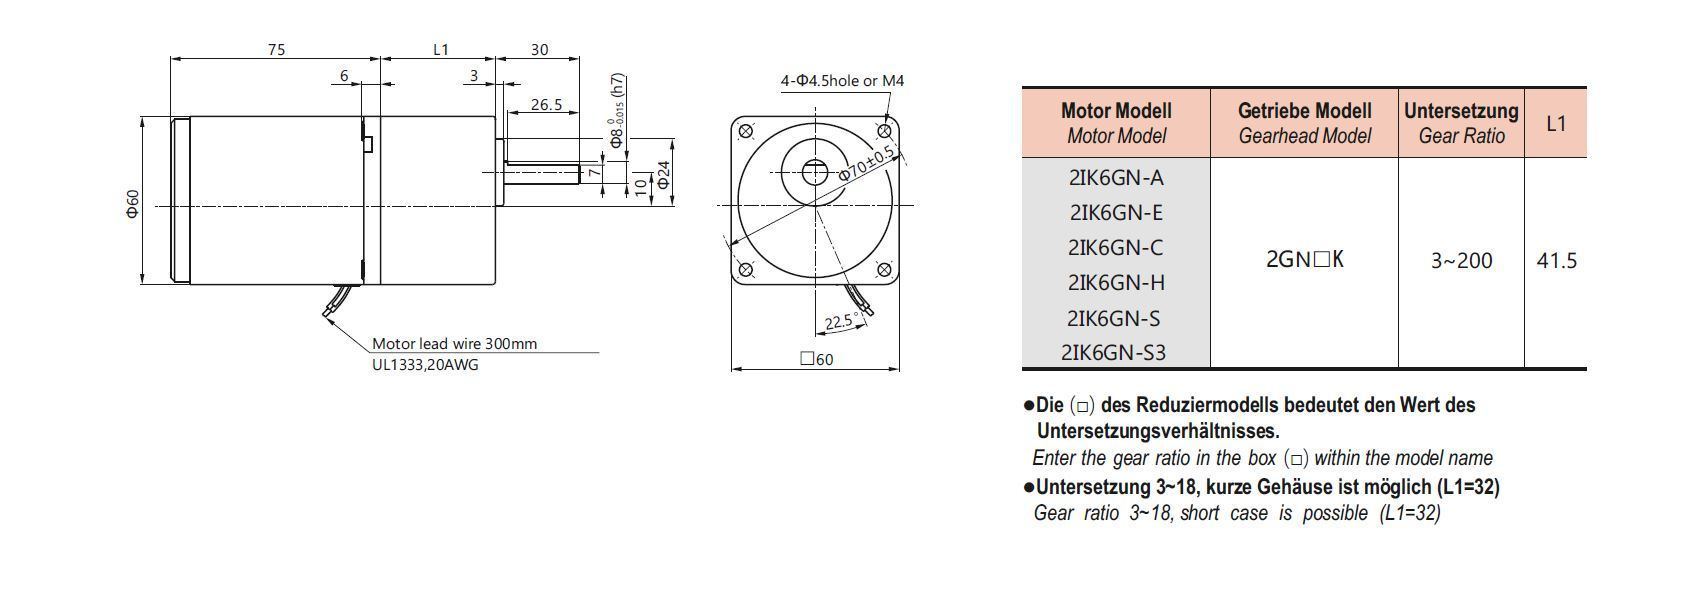 AC Getriebemotor AC Motoren mit Getriebe 6W 220V CW//CCW Untersetzung 75